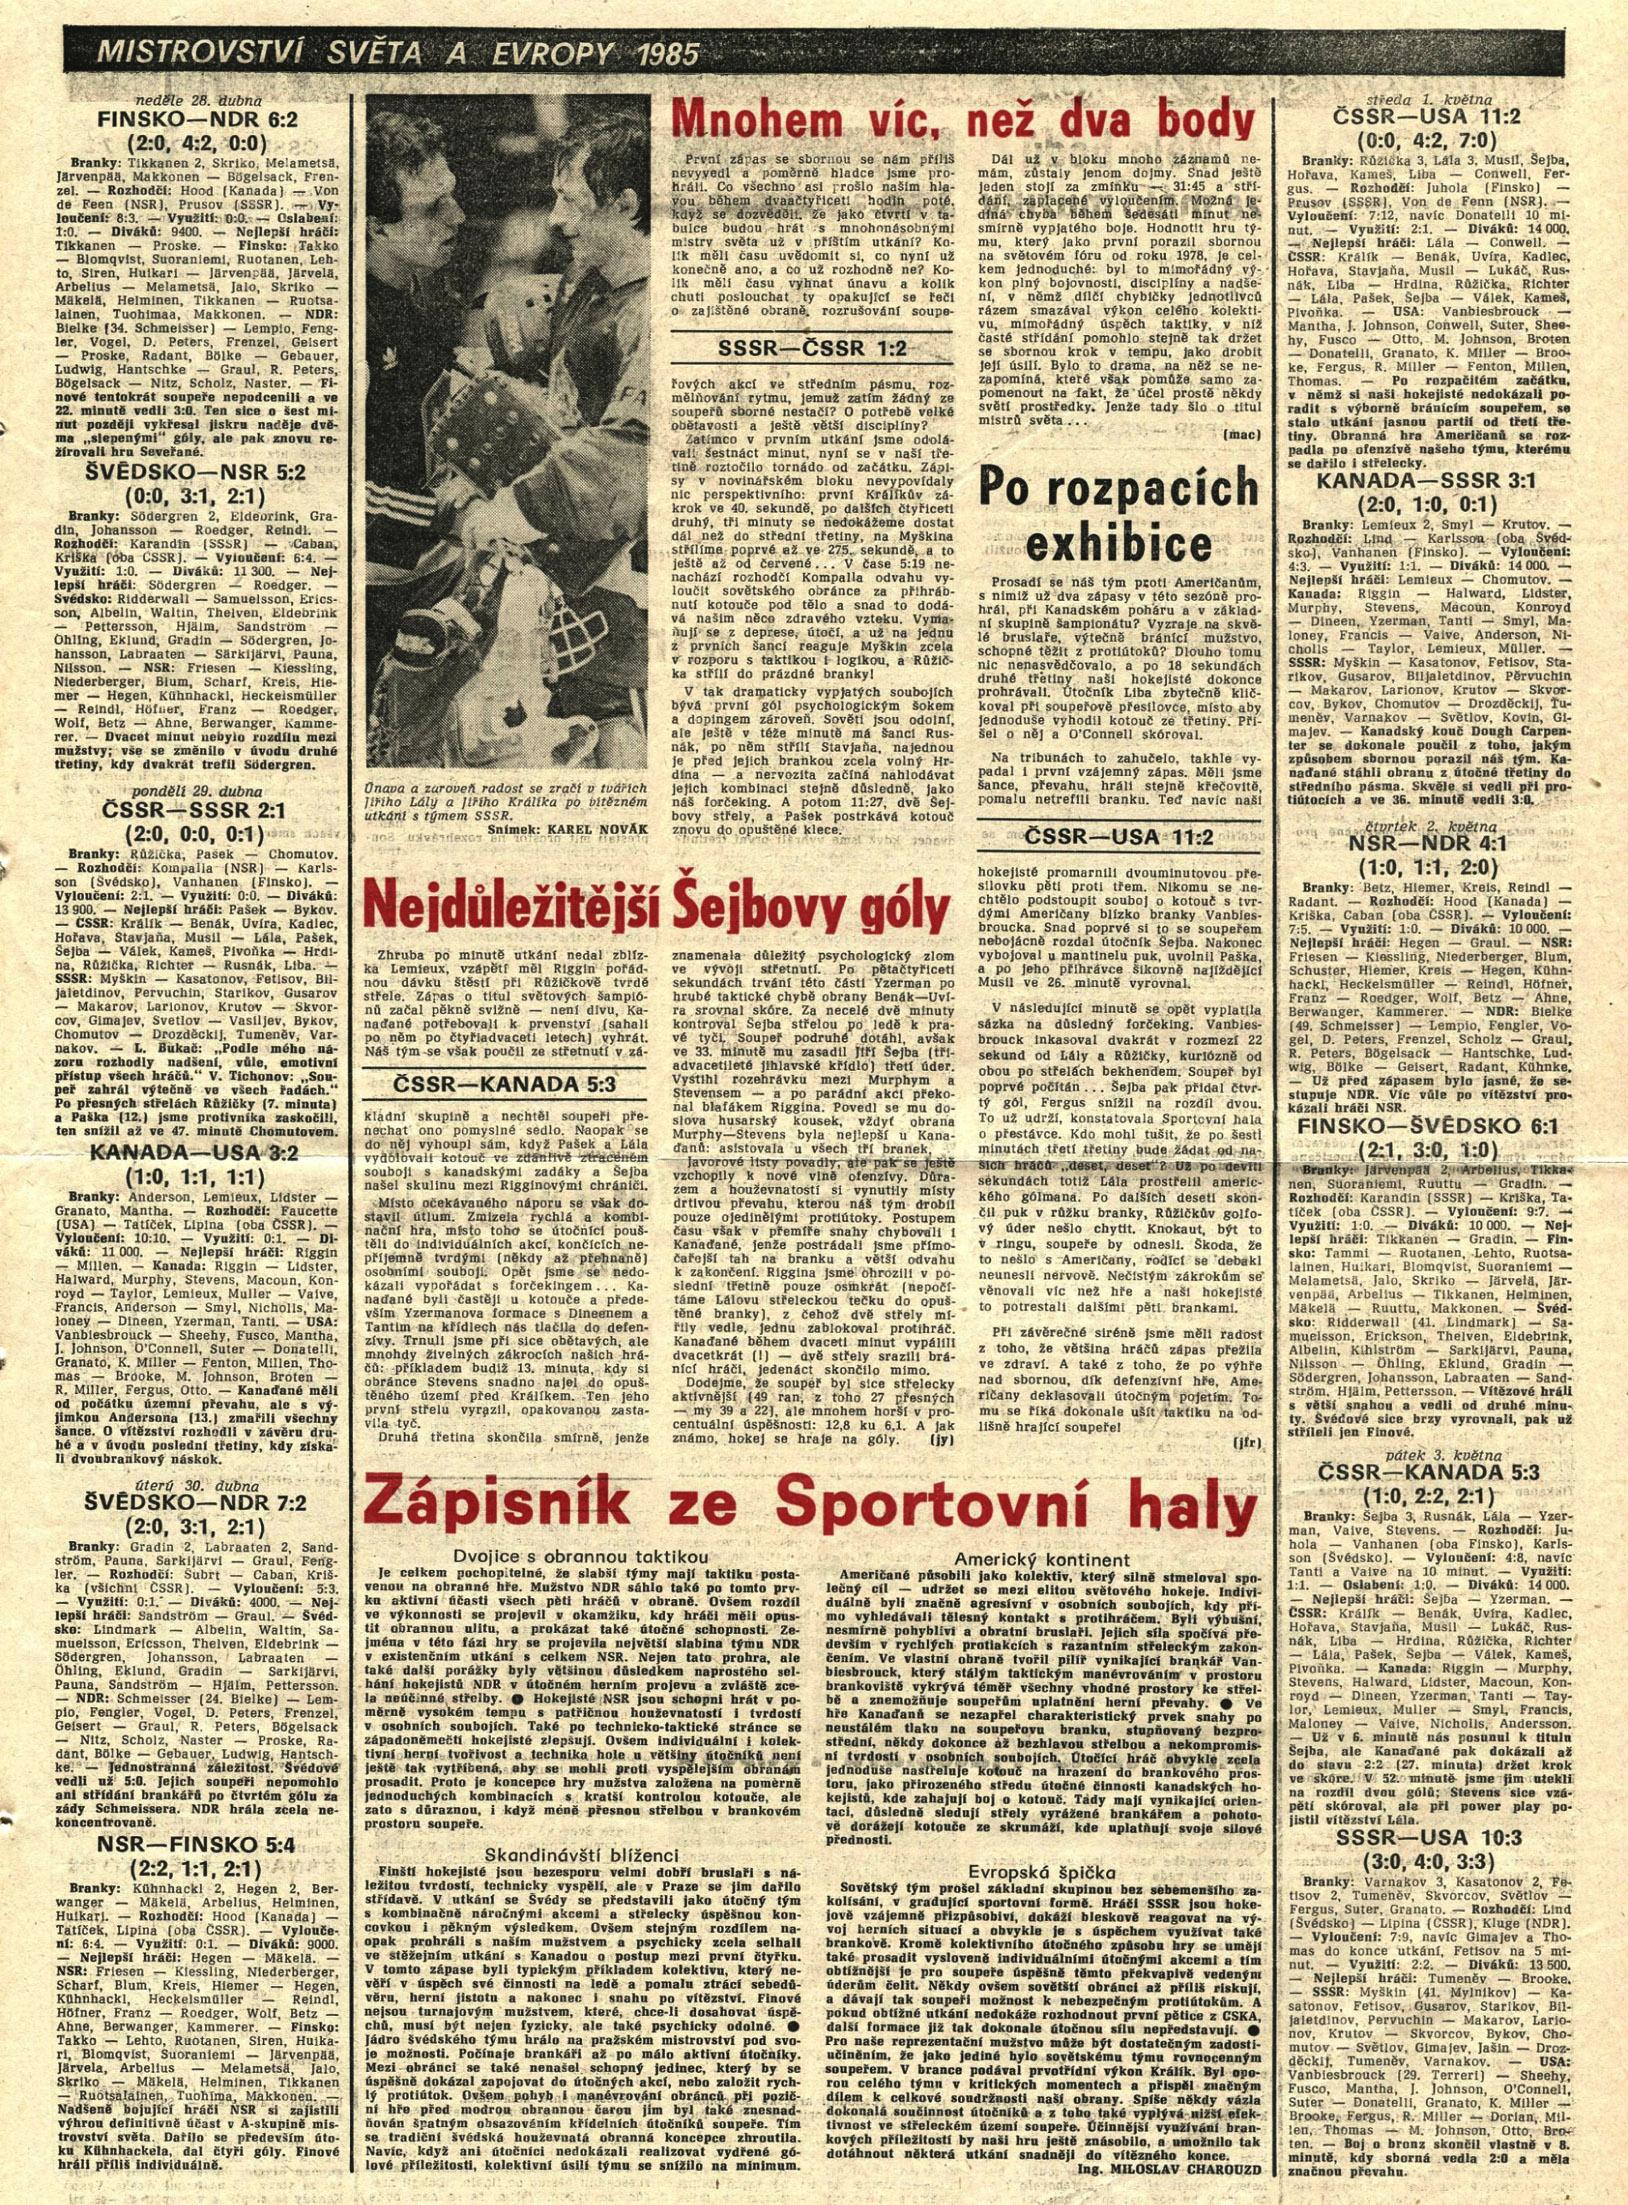 Gol 1985 # 18-5.jpg